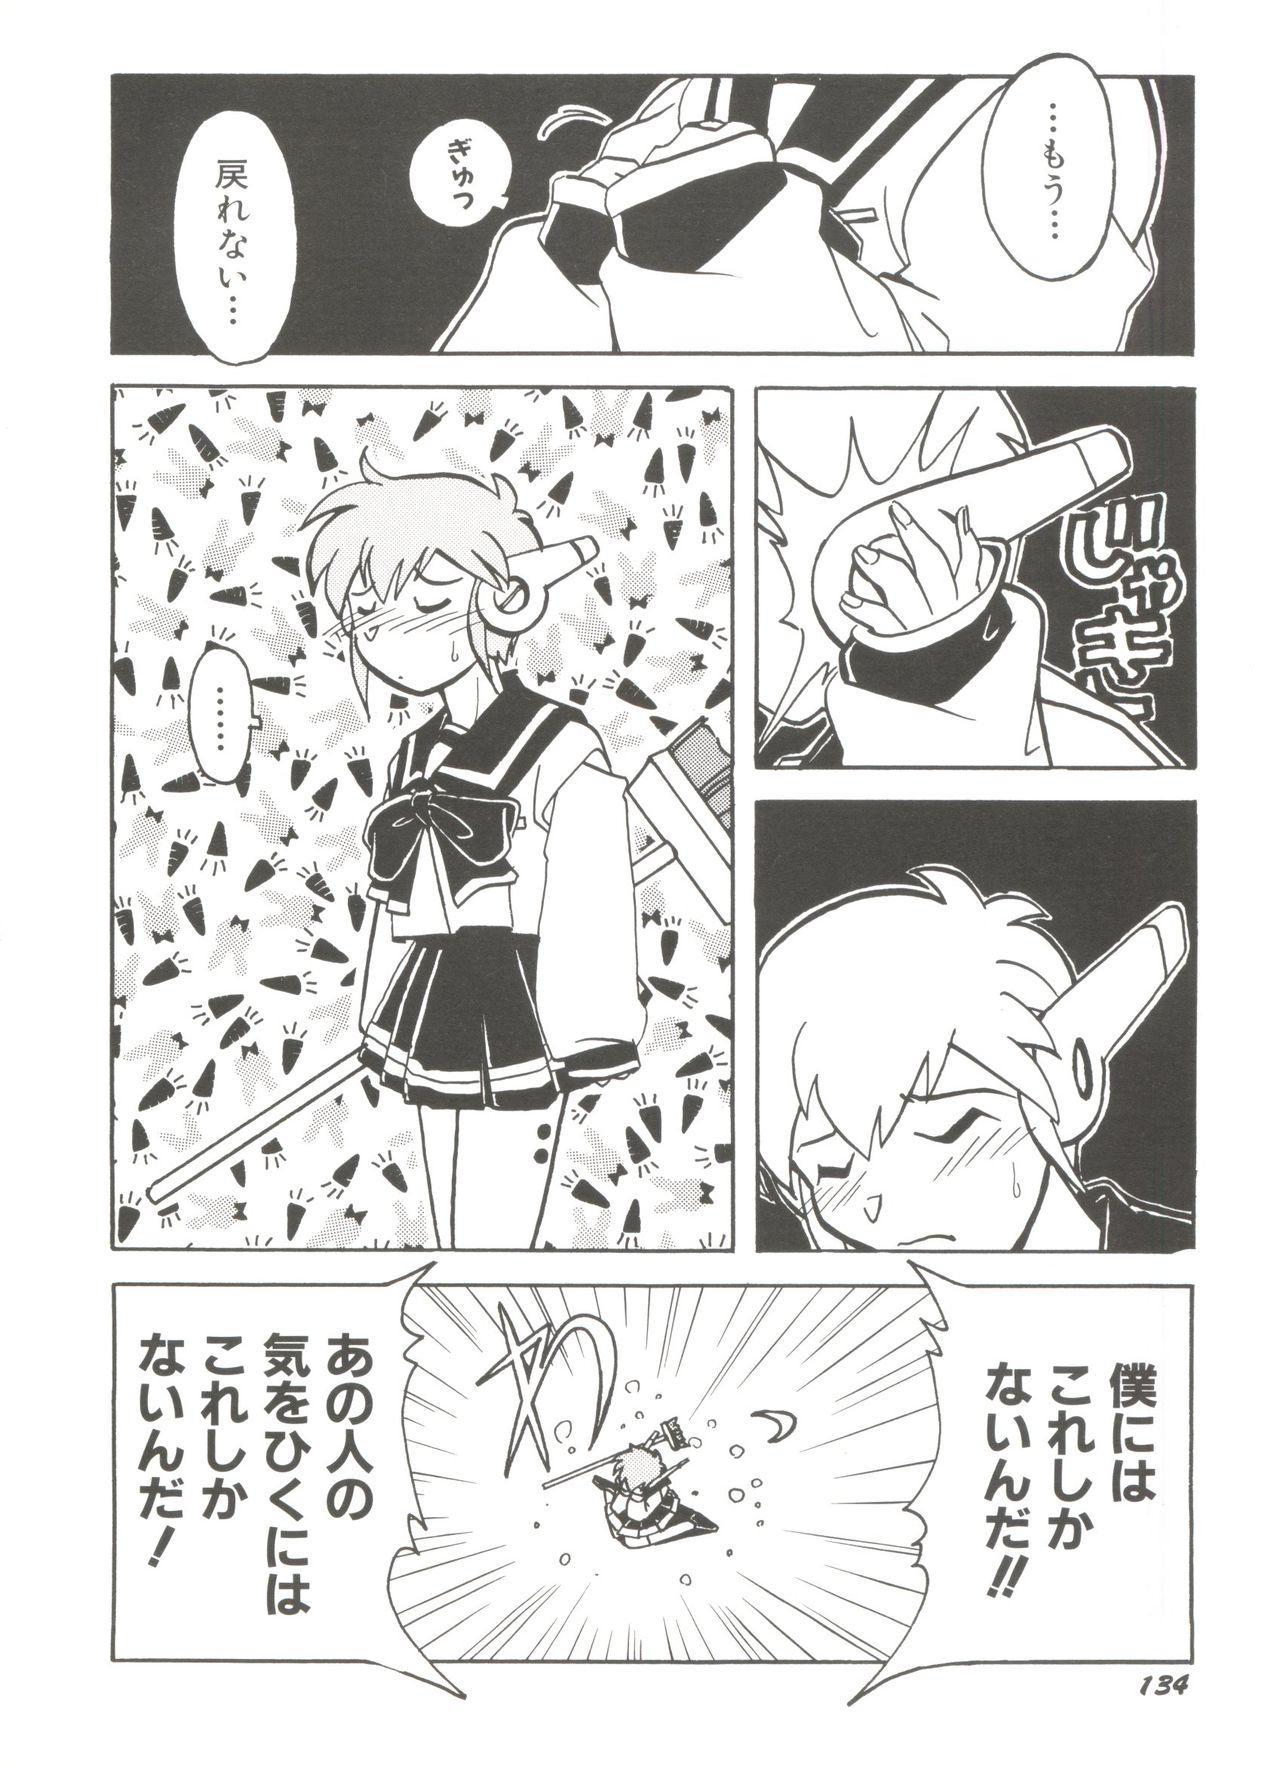 [Anthology] Denei Tamatebako 8 - Utakata no Tenshi-tachi II (Various) 135